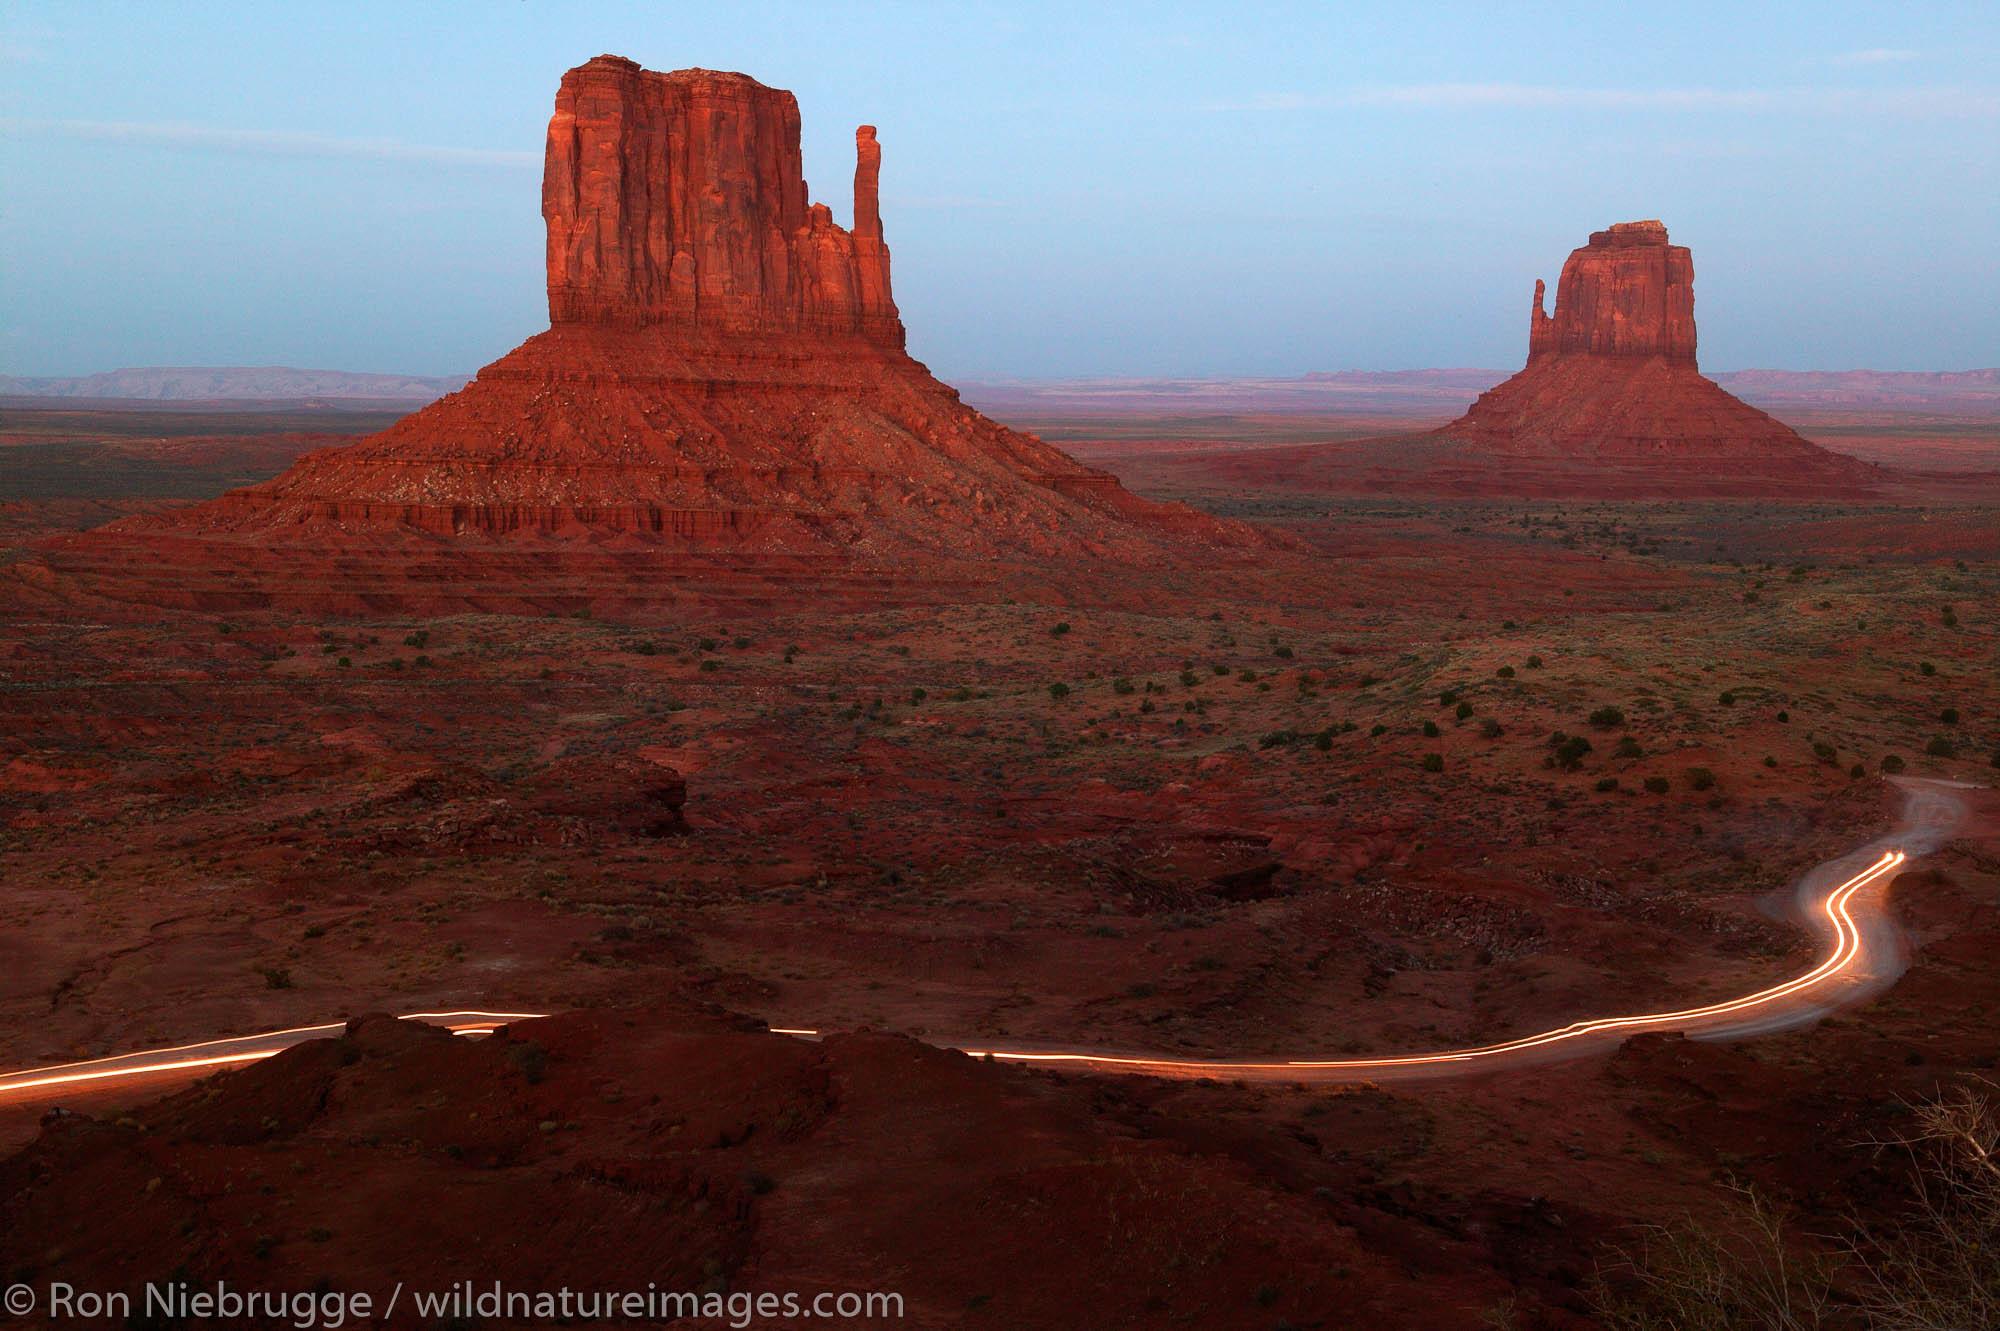 Vehicles leaving Monument Valley Navajo Tribal Park, Utah.